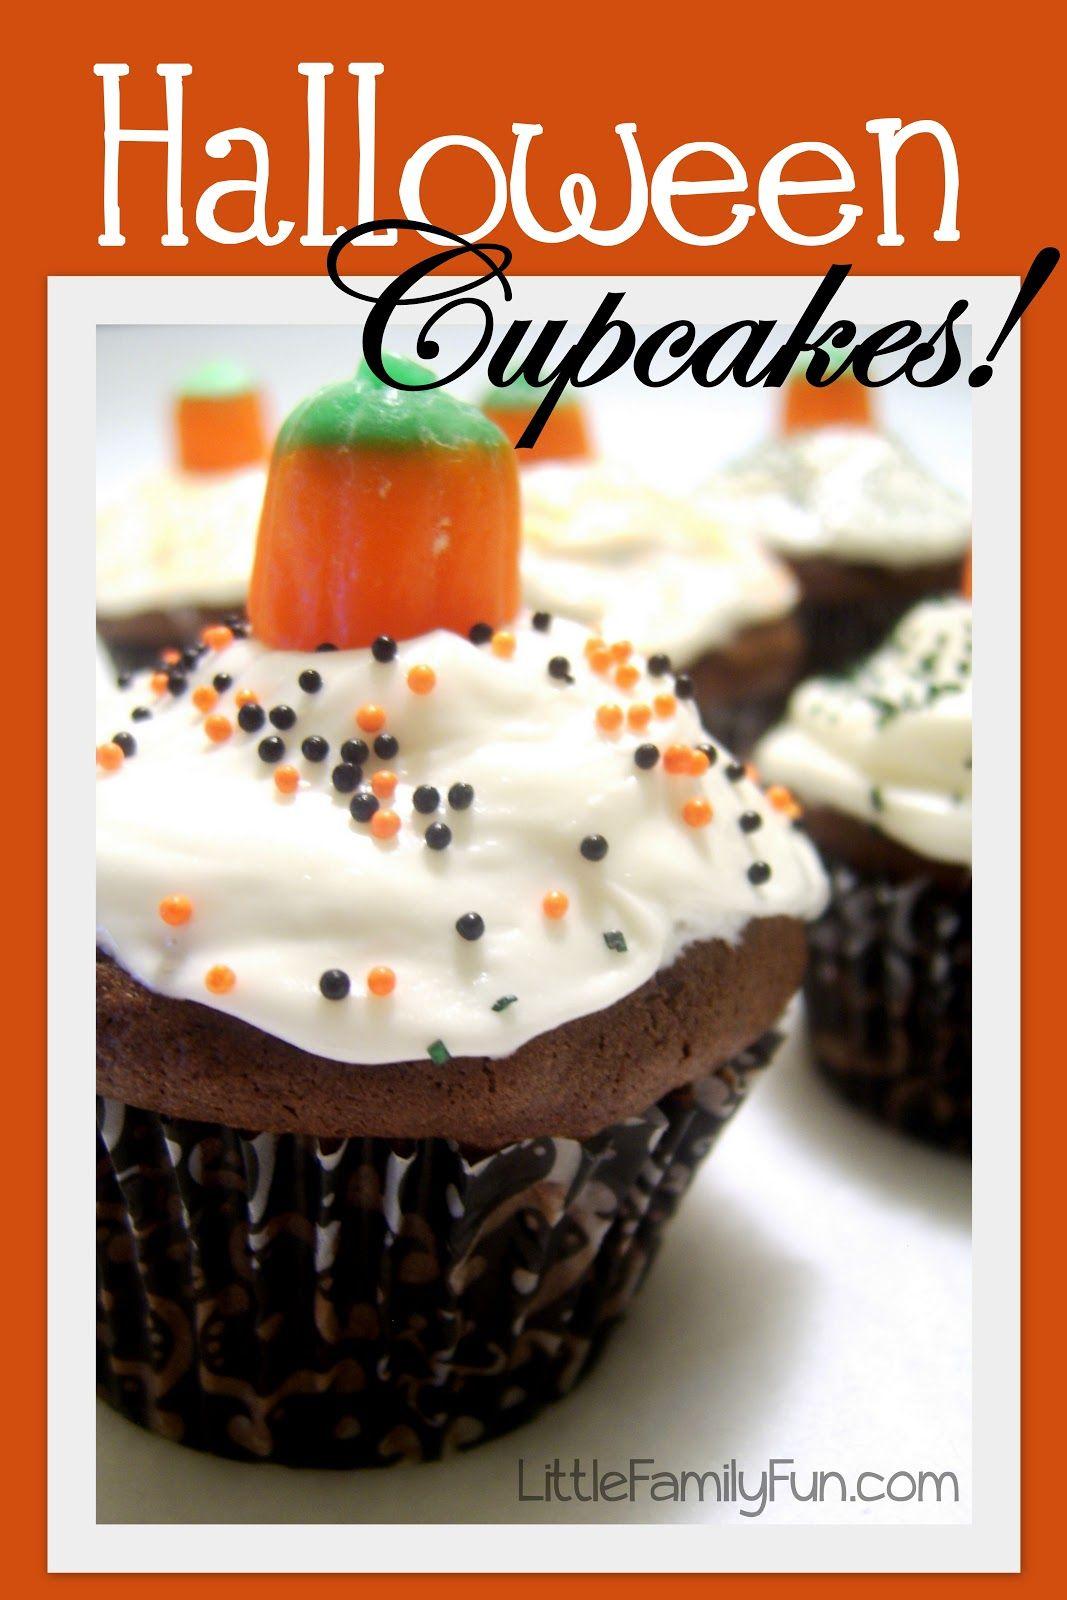 family fun halloween cupcakes